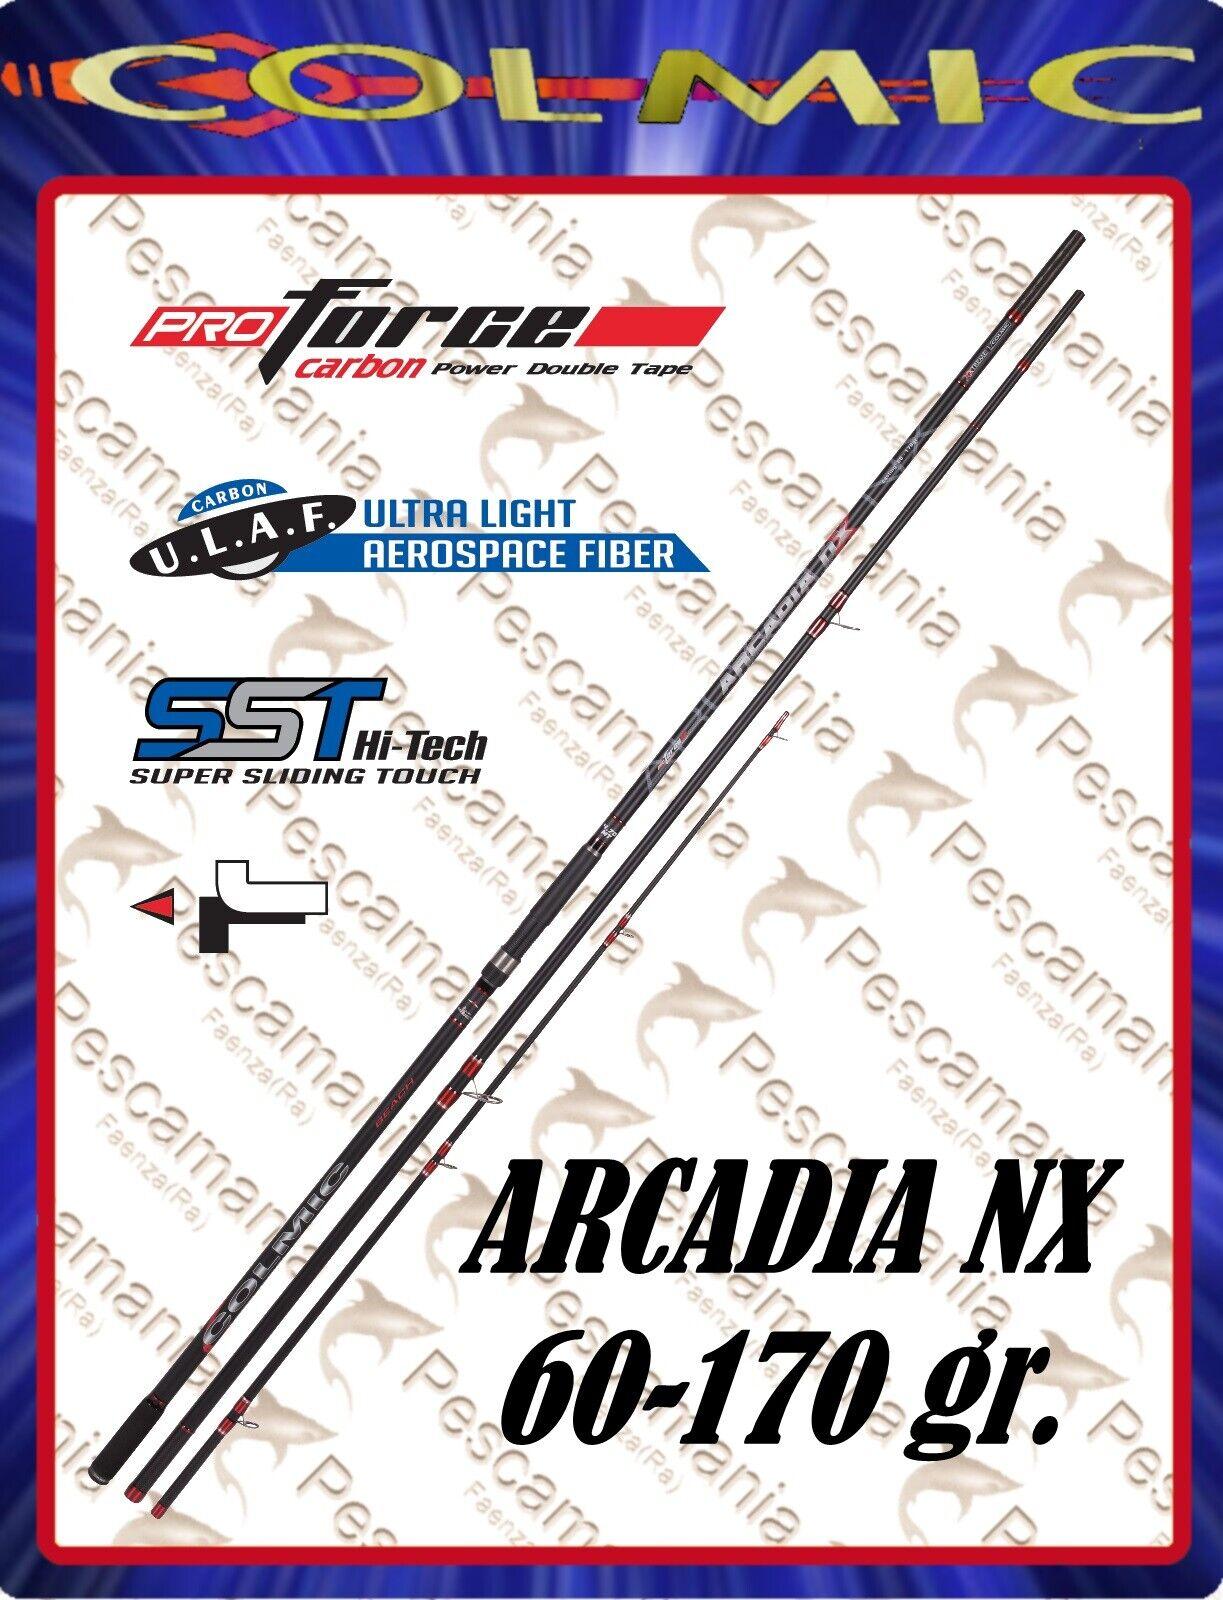 Angelrute Colmic Arcadia NX beach ledgering Pontonchutz 60-170 gr gr gr 4,40-4,70mt 697f62